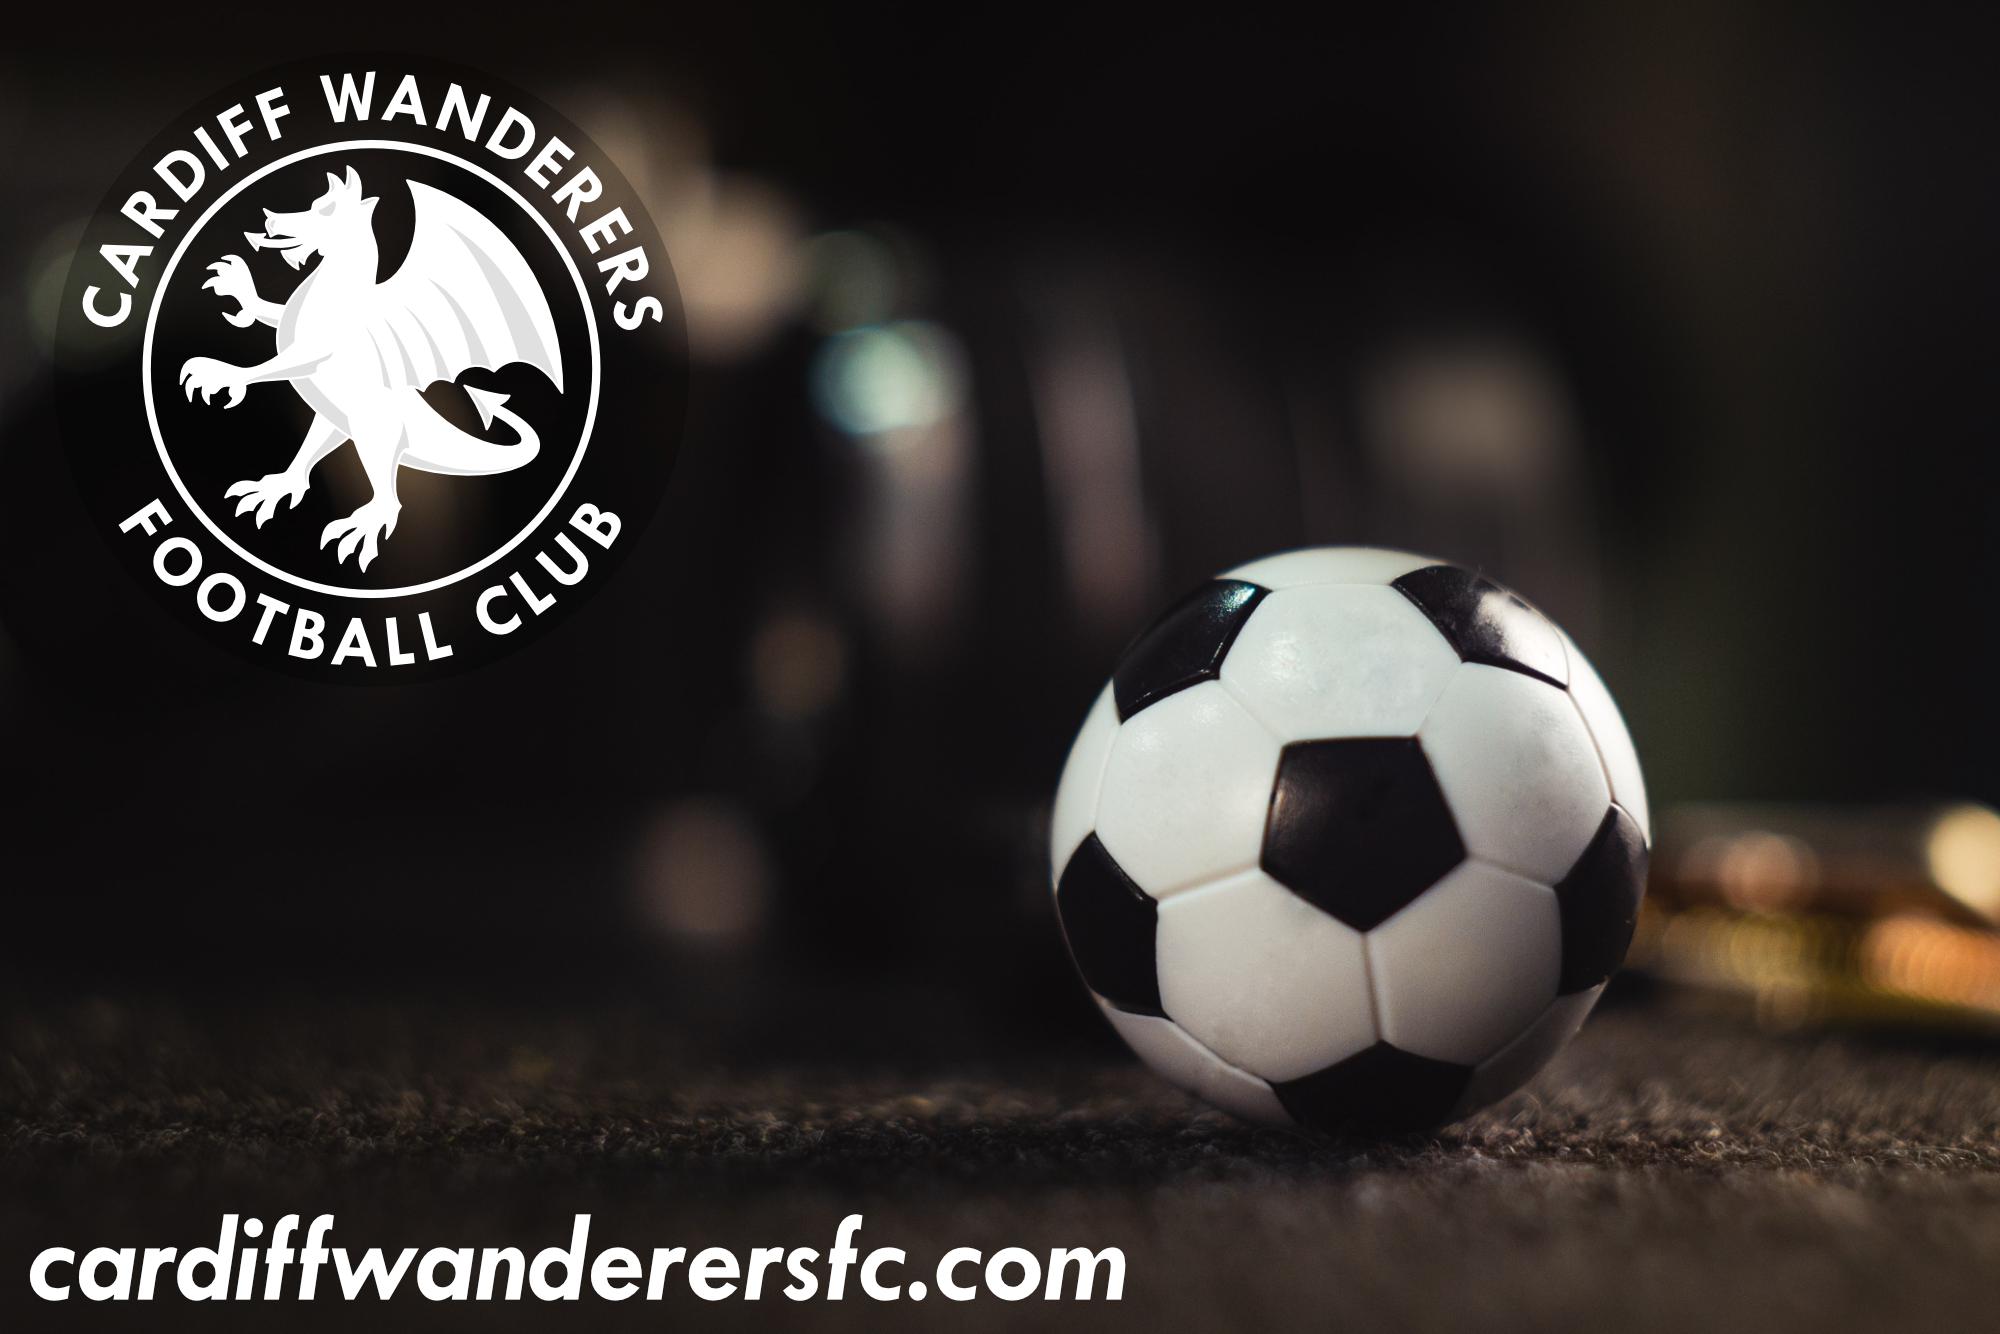 Cardiff Wanderers Football Club banner